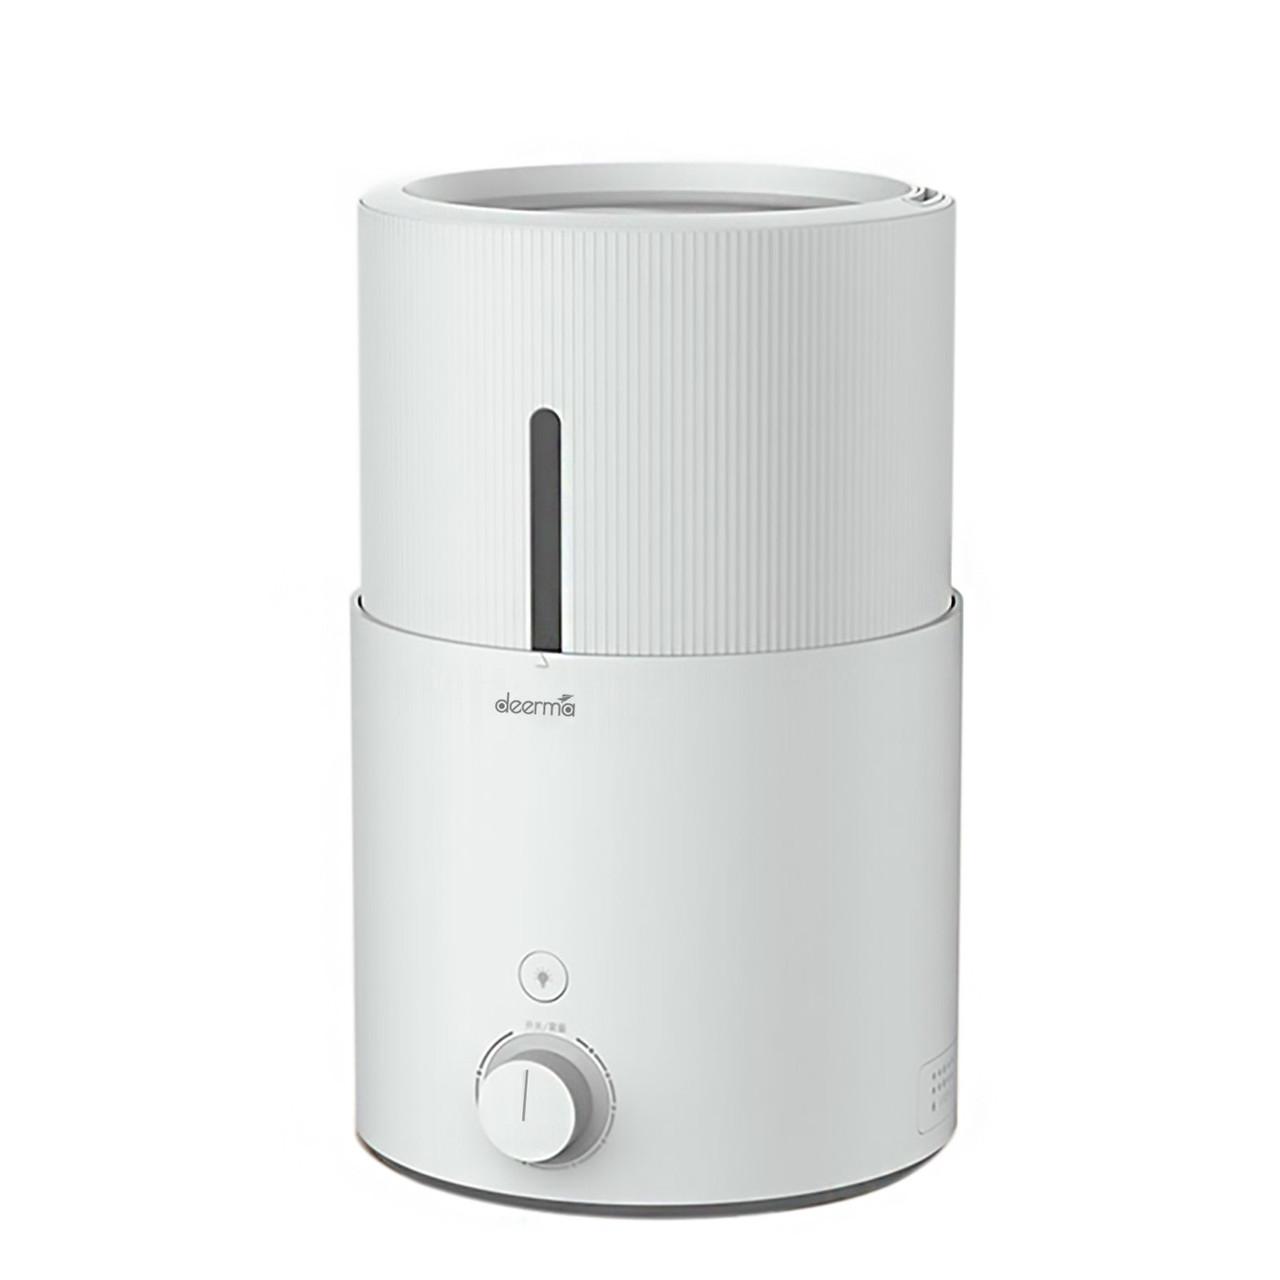 Увлажнитель воздуха c УФ Xiaomi Deerma Humidifier SJS600, White